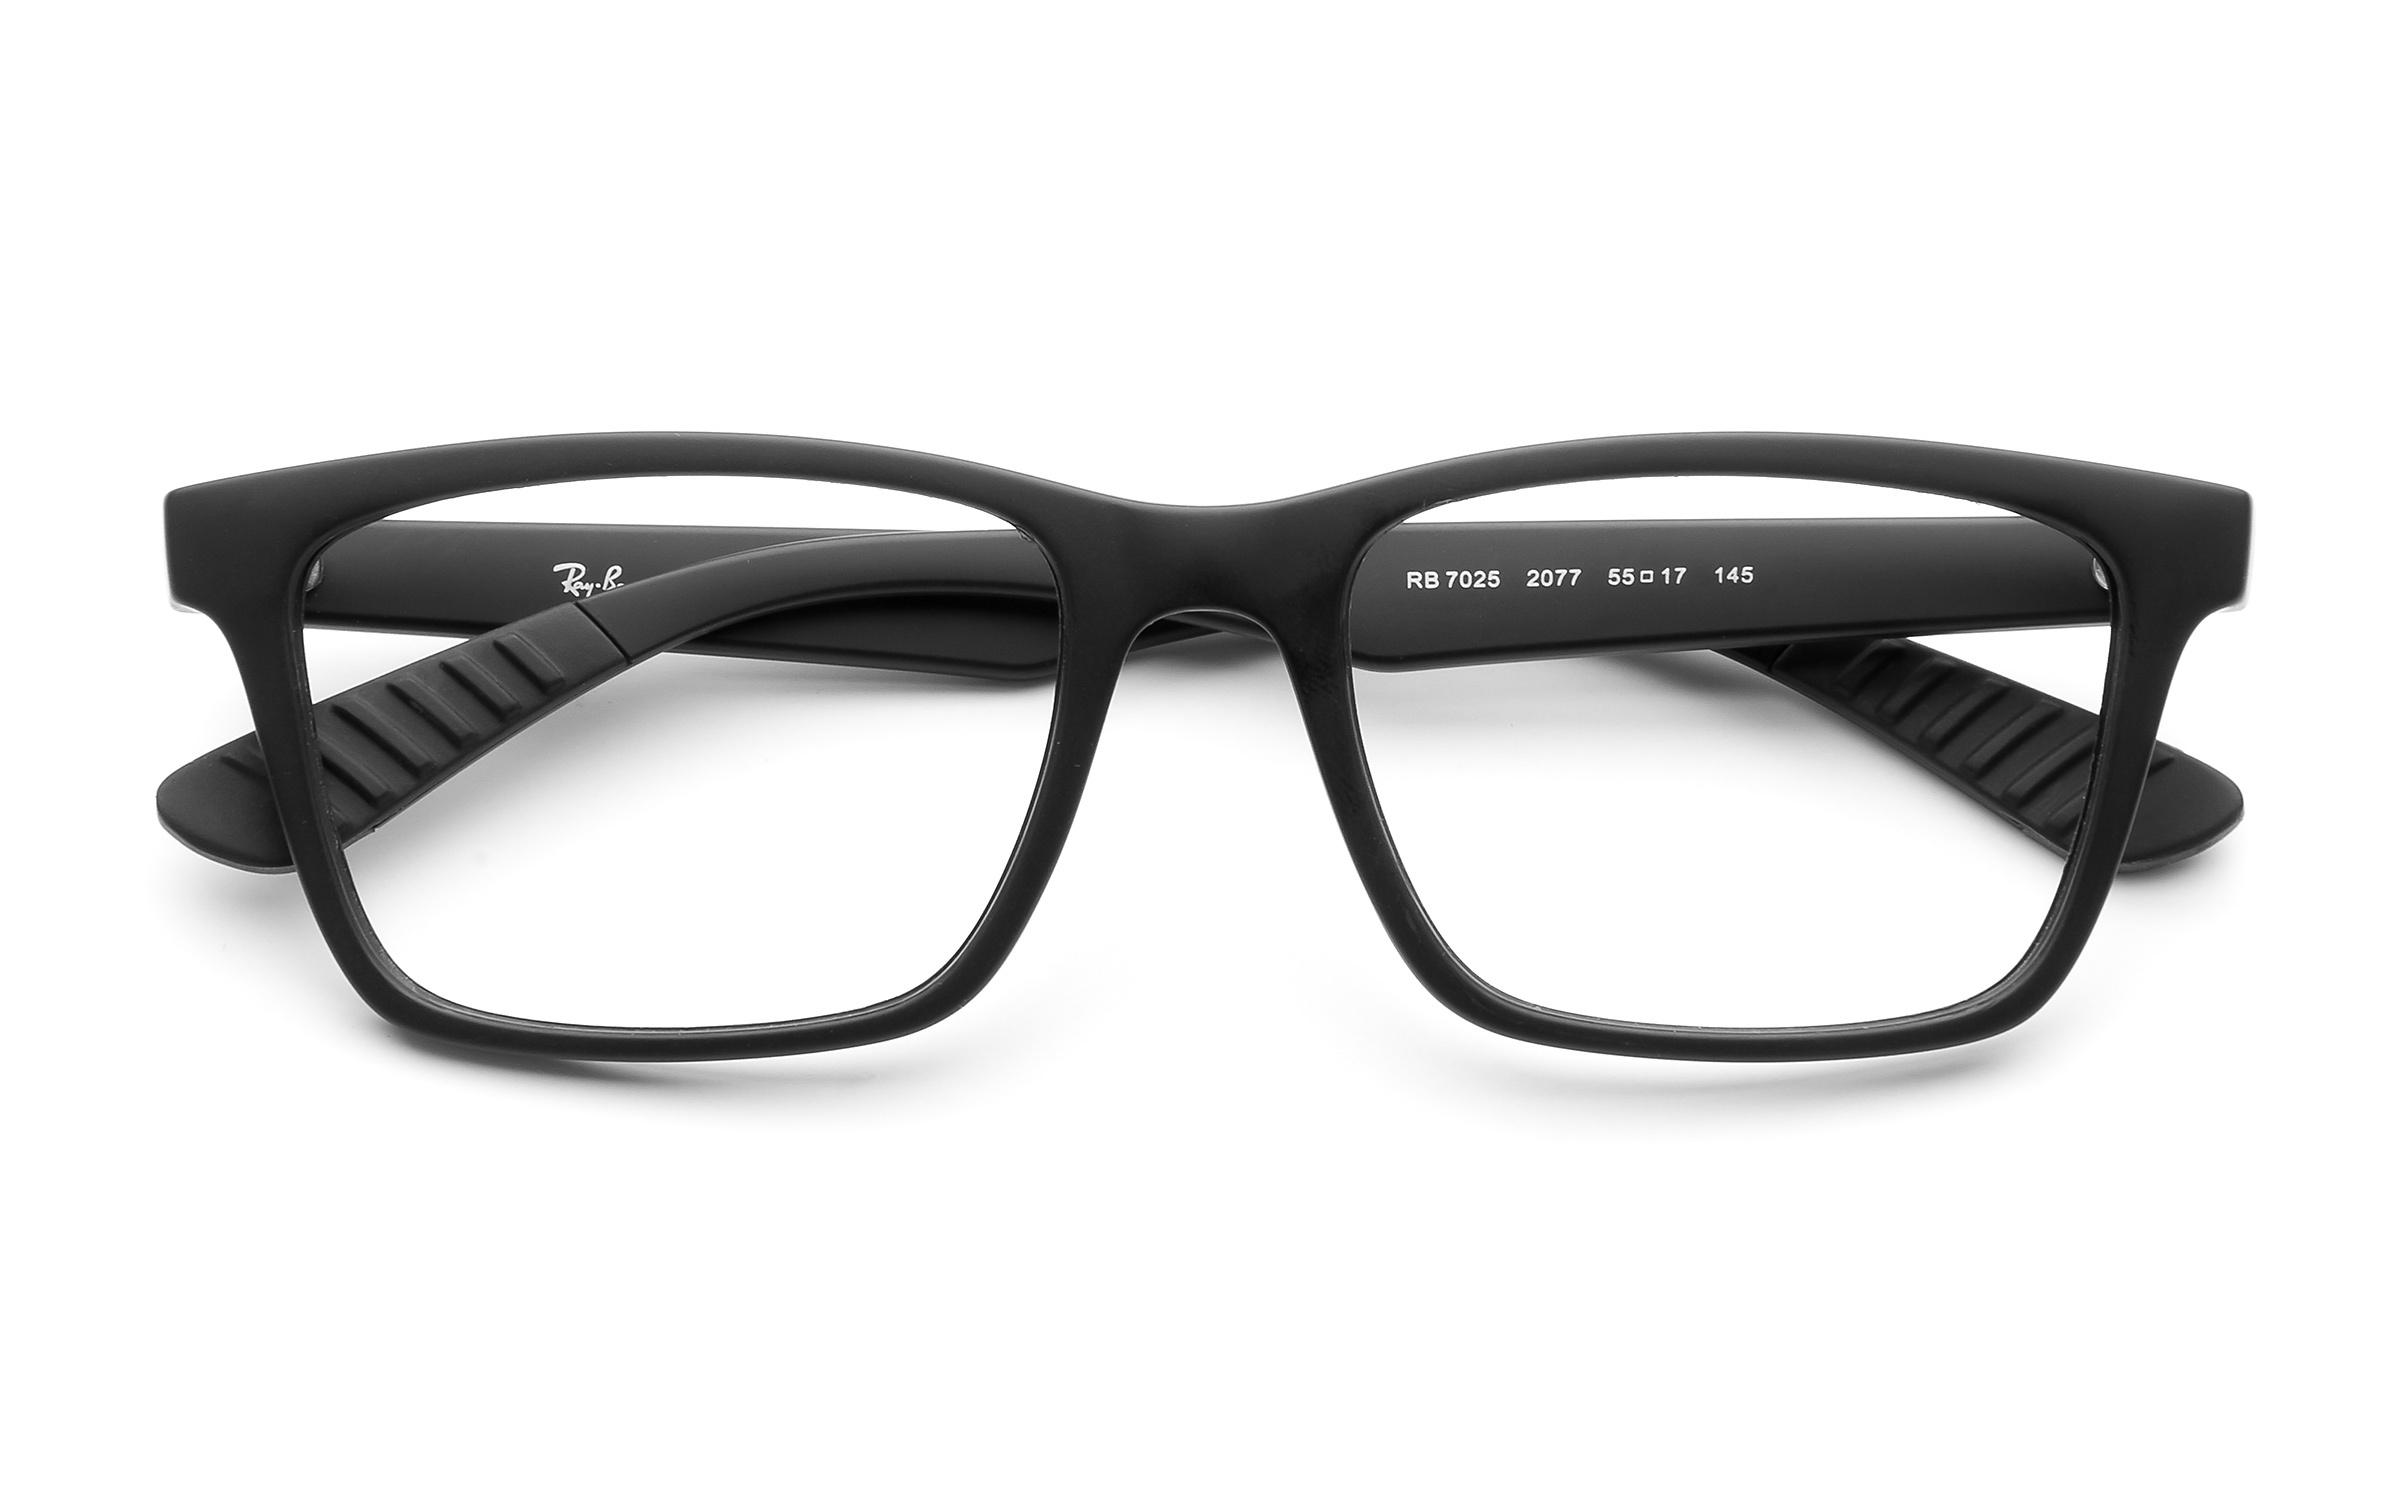 ray ban vision 2017 klblhx | Cheap sunglasses